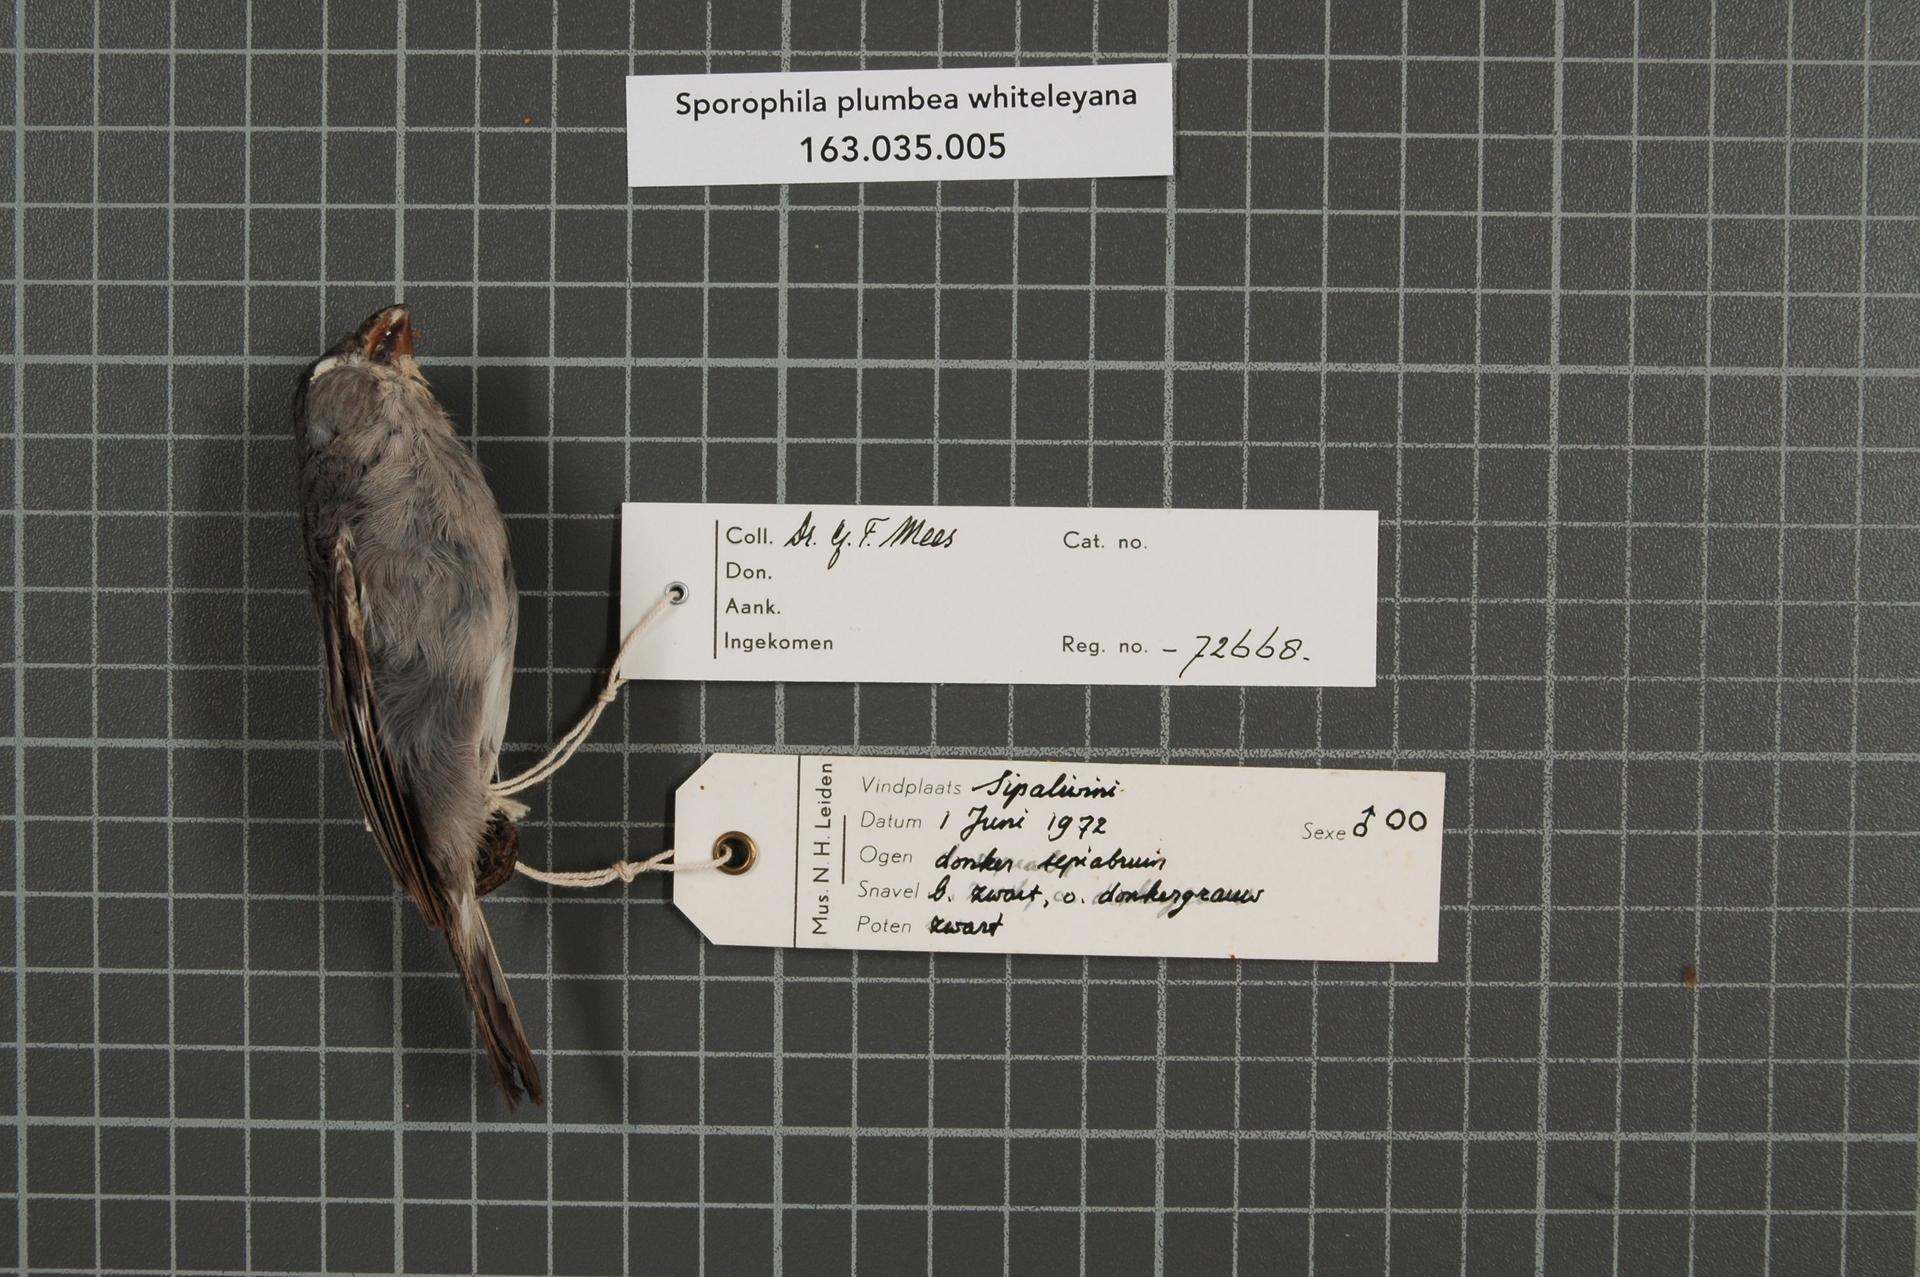 RMNH.AVES.72668 | Sporophila plumbea whiteleyana (Sharpe, 1888)